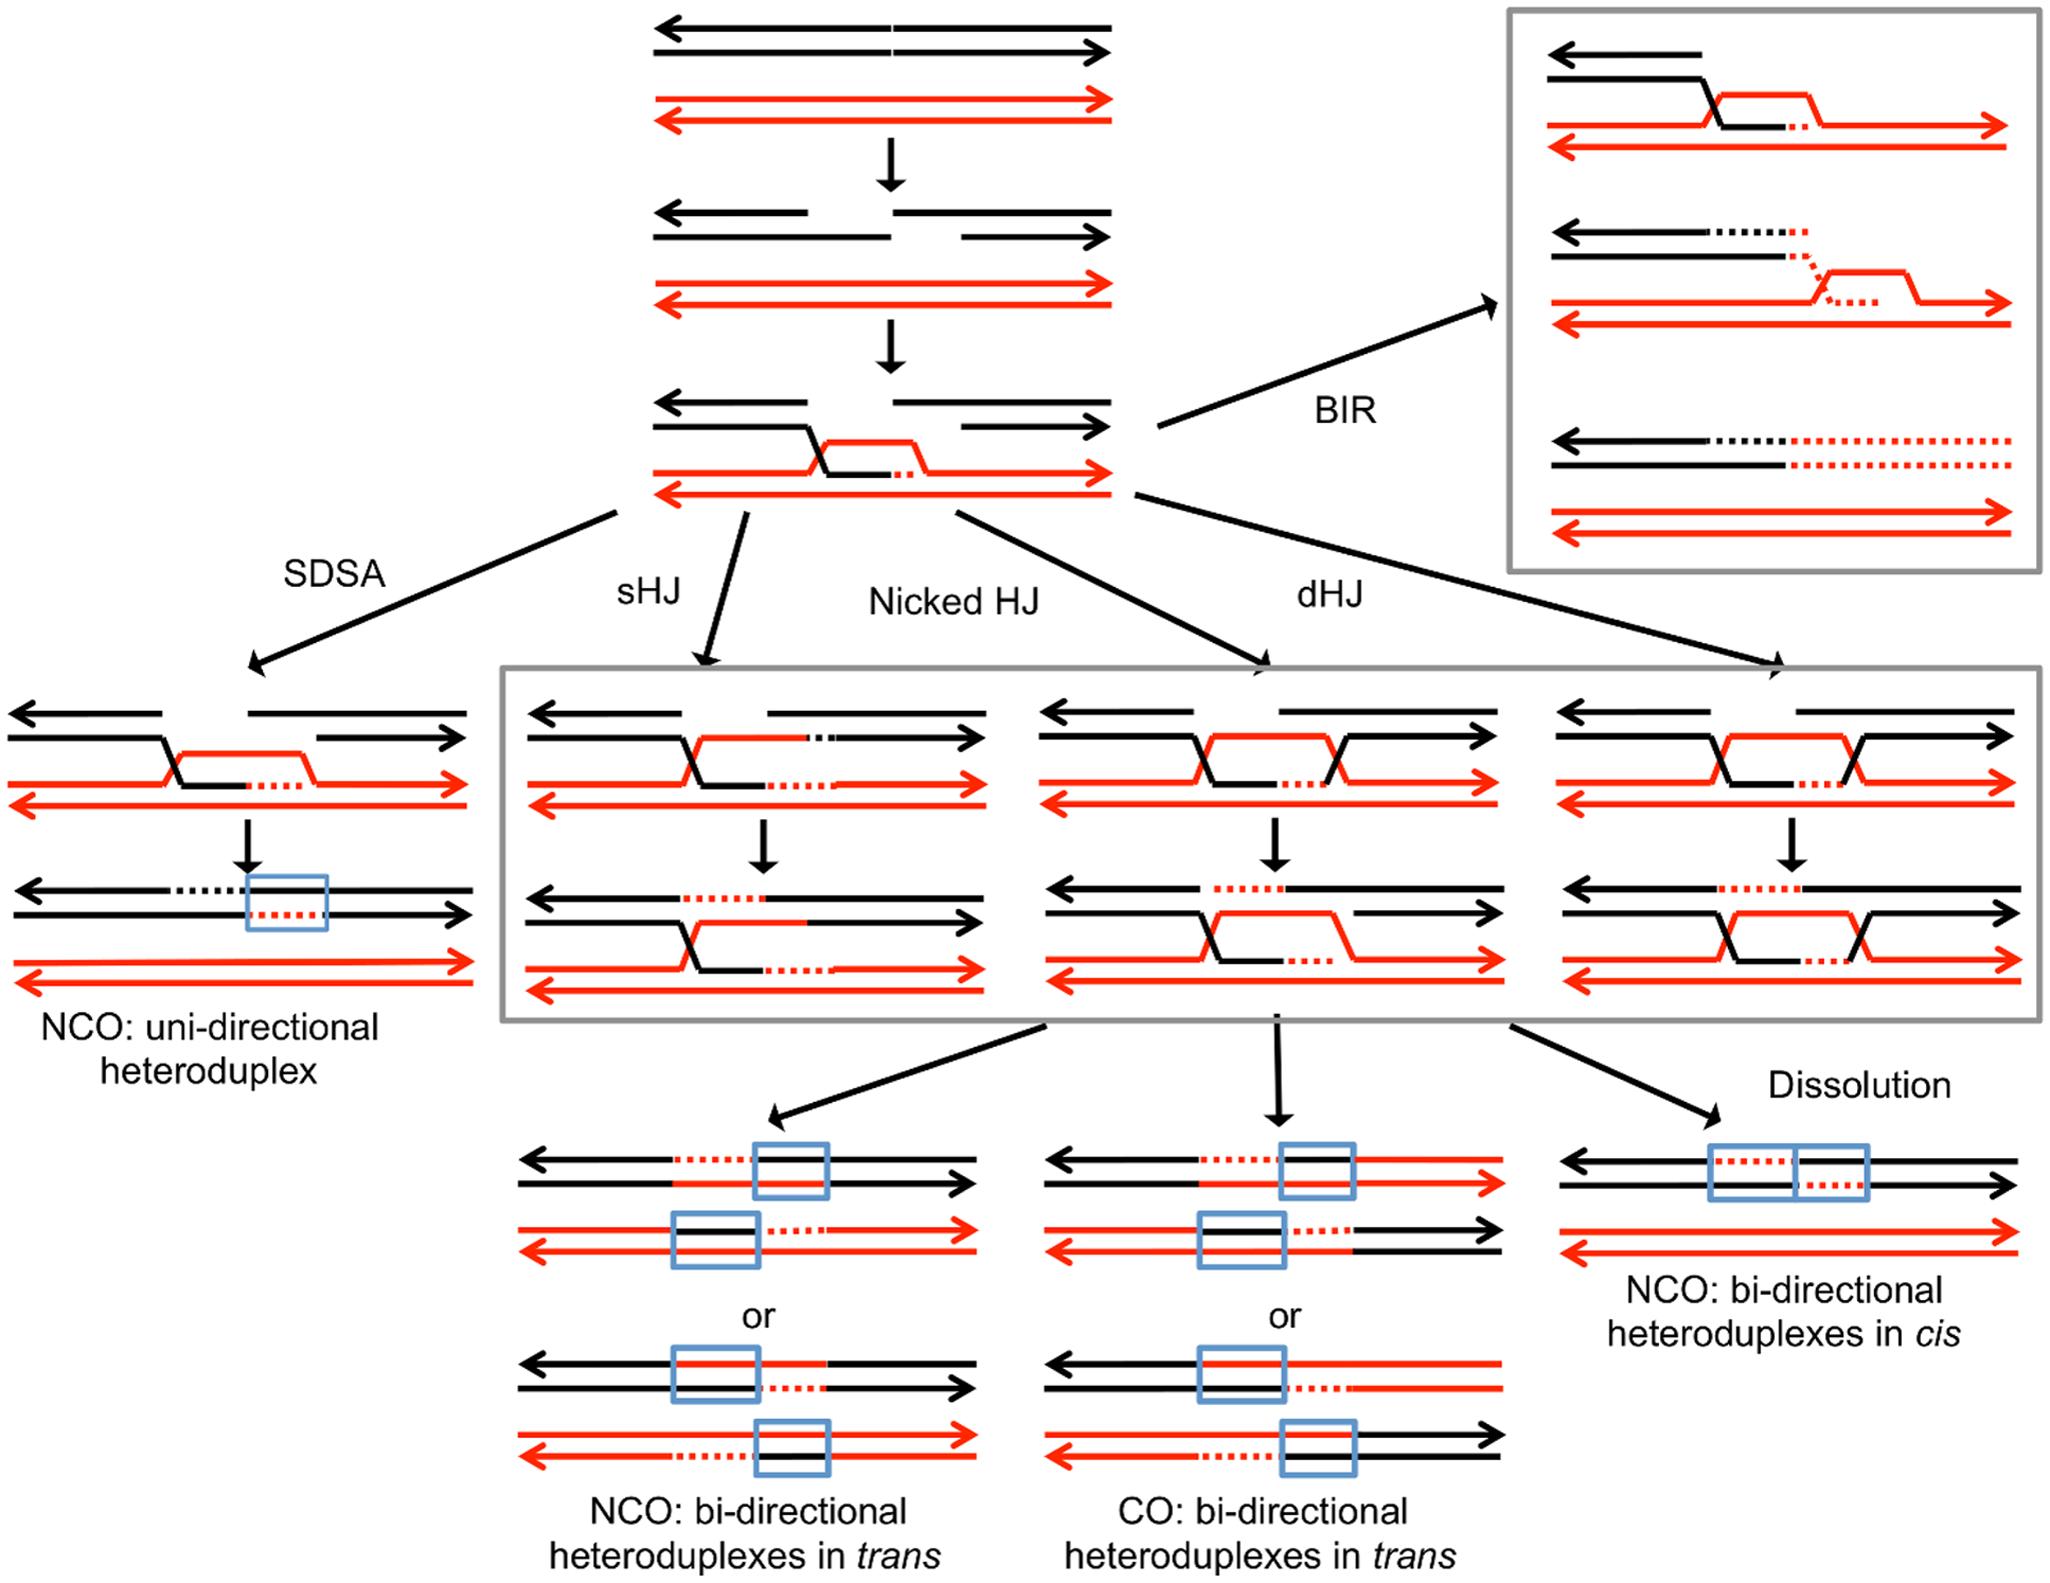 Pathways of homologous recombination.